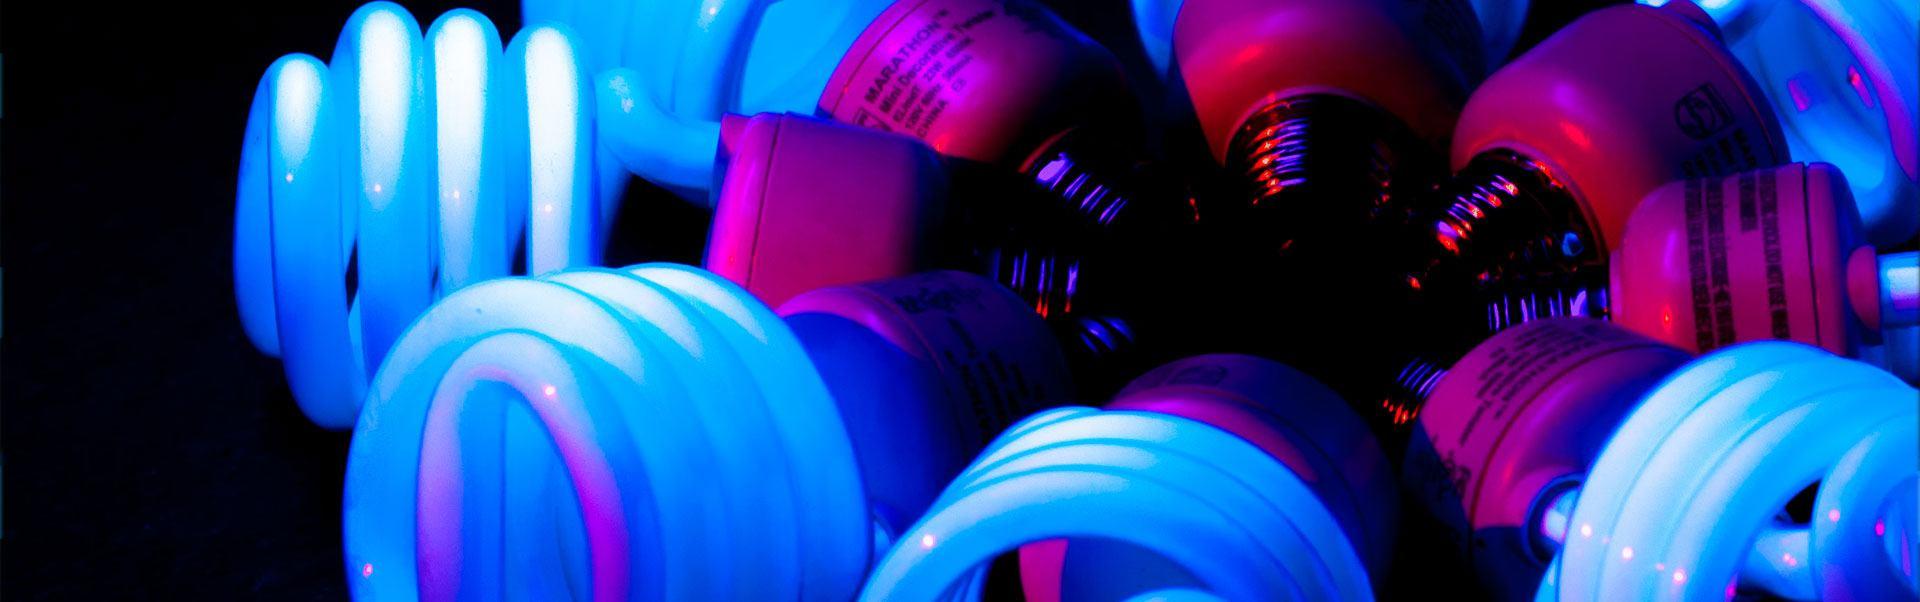 SCI BMS lighting control using KNX/Dali